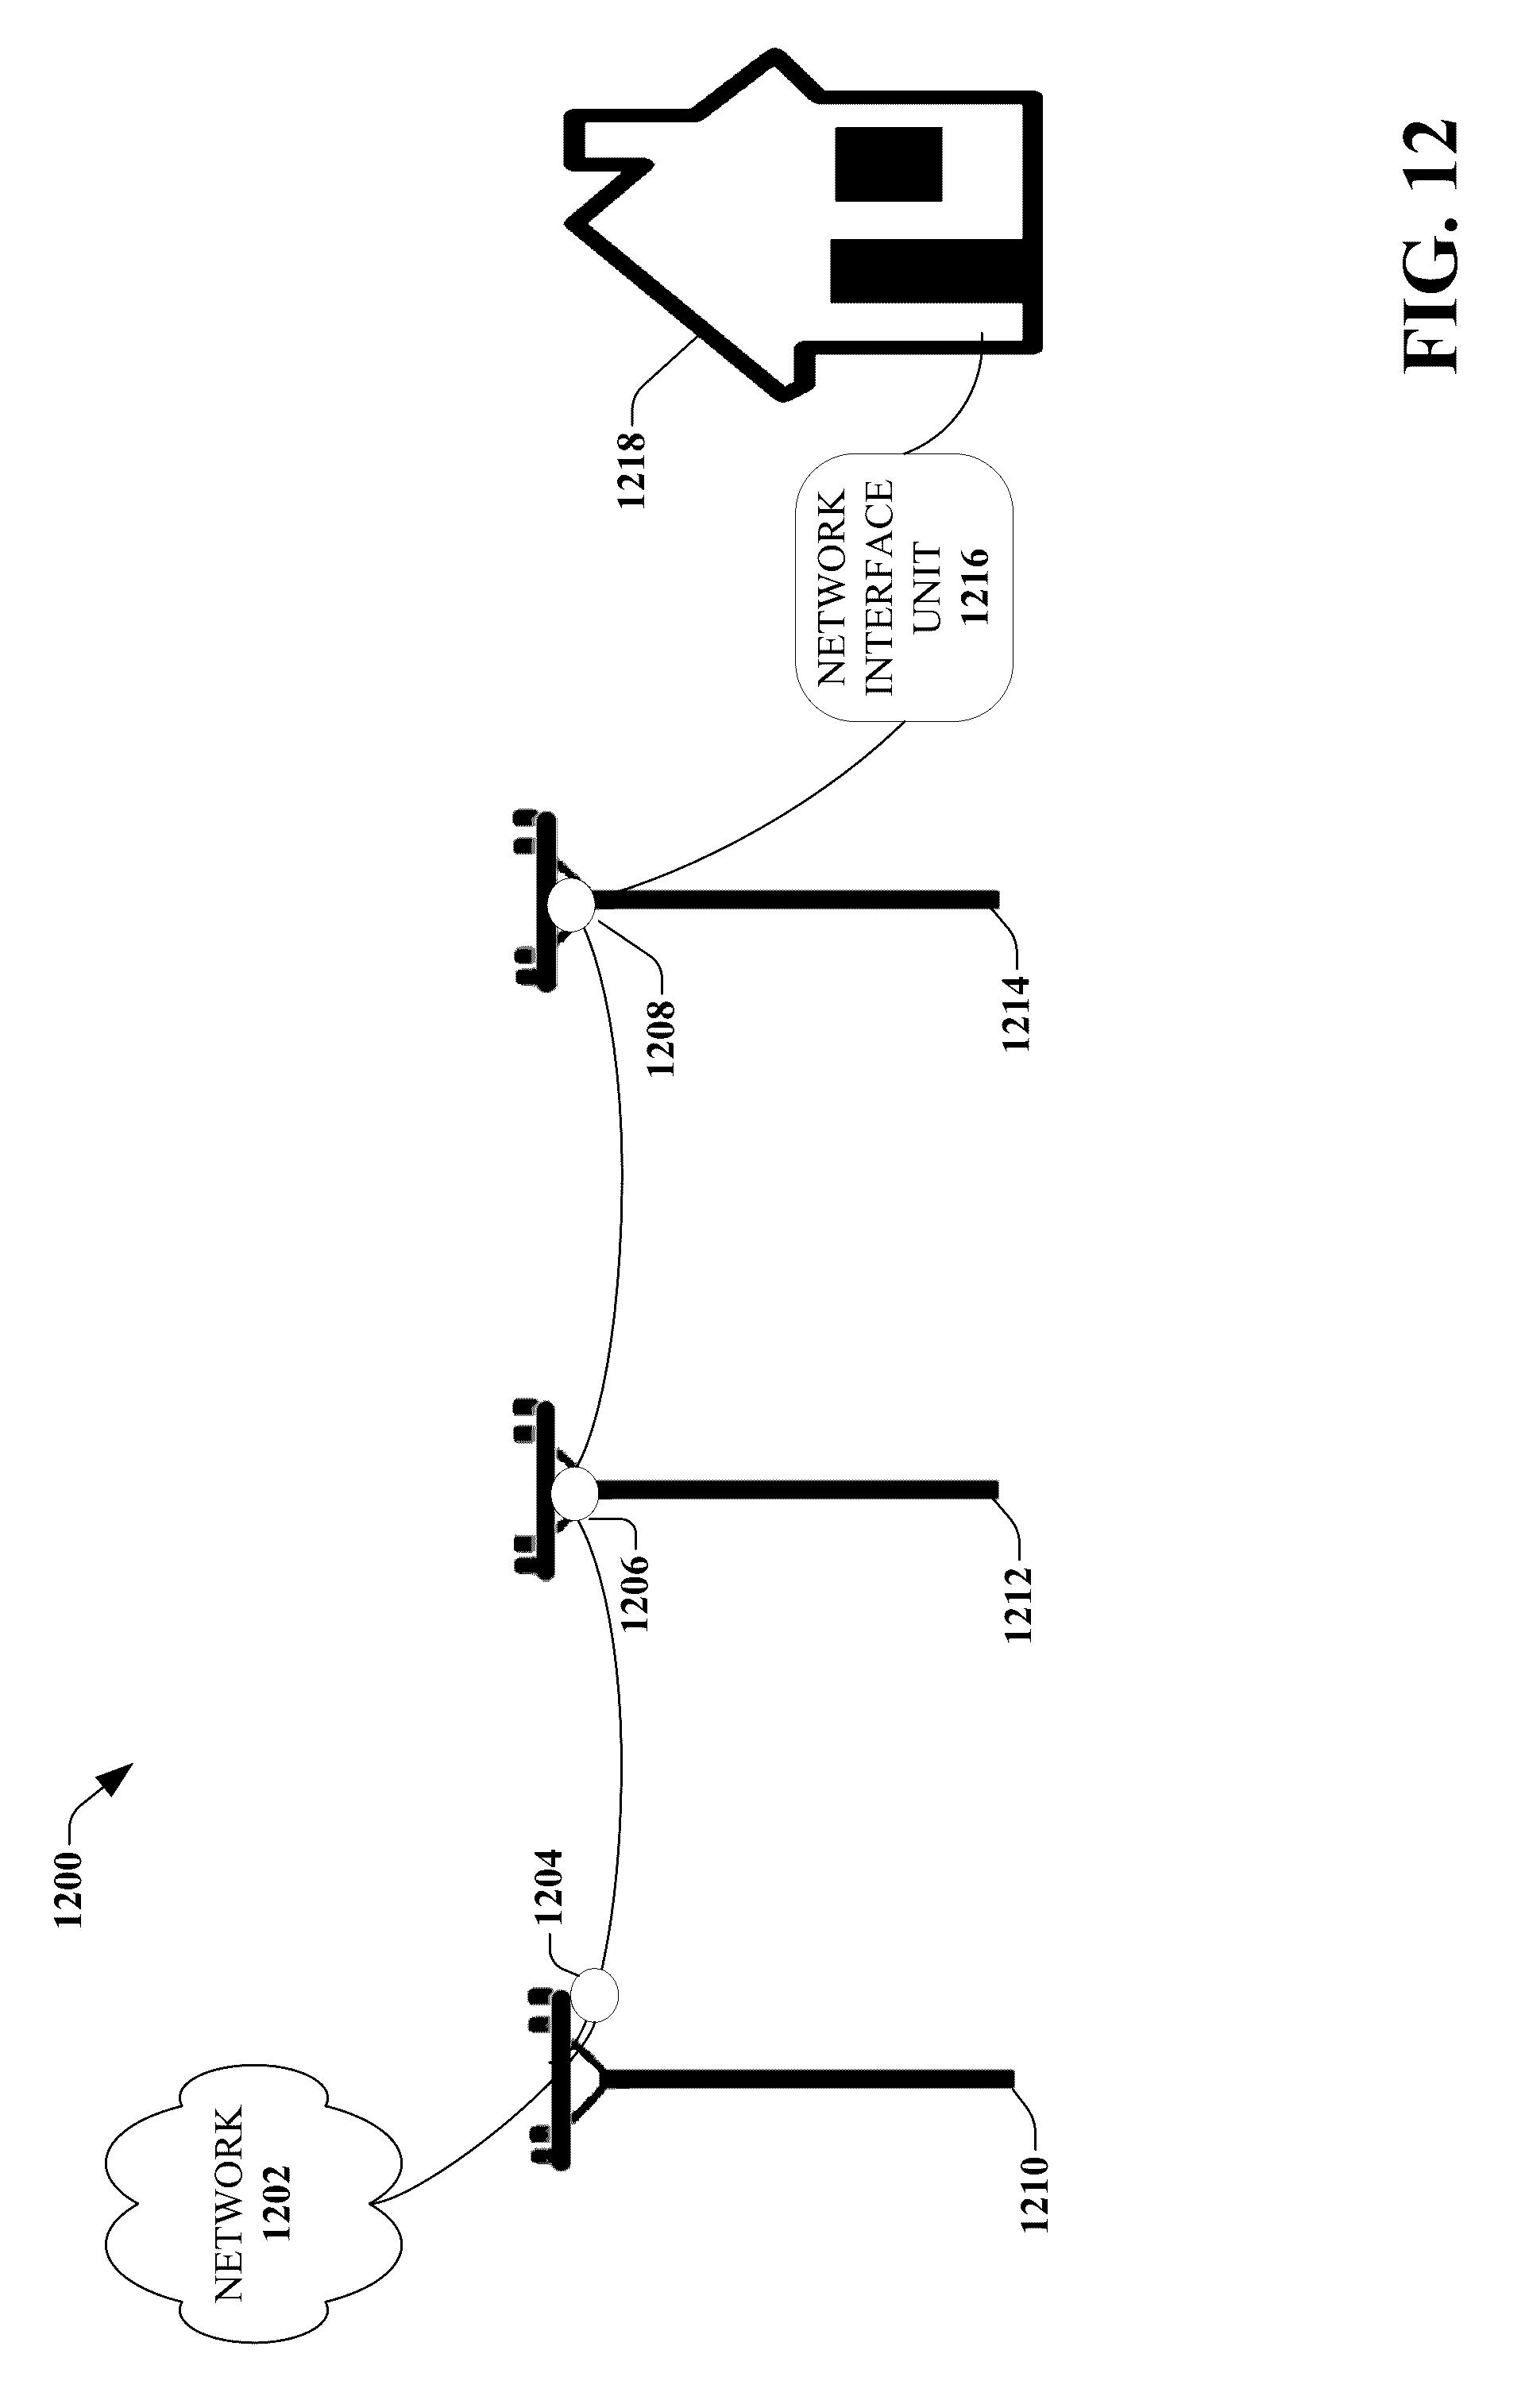 Us9685992b2 Circuit Panel Network And Methods Thereof Google Patents Leland Faraday Motor Wiring Diagram